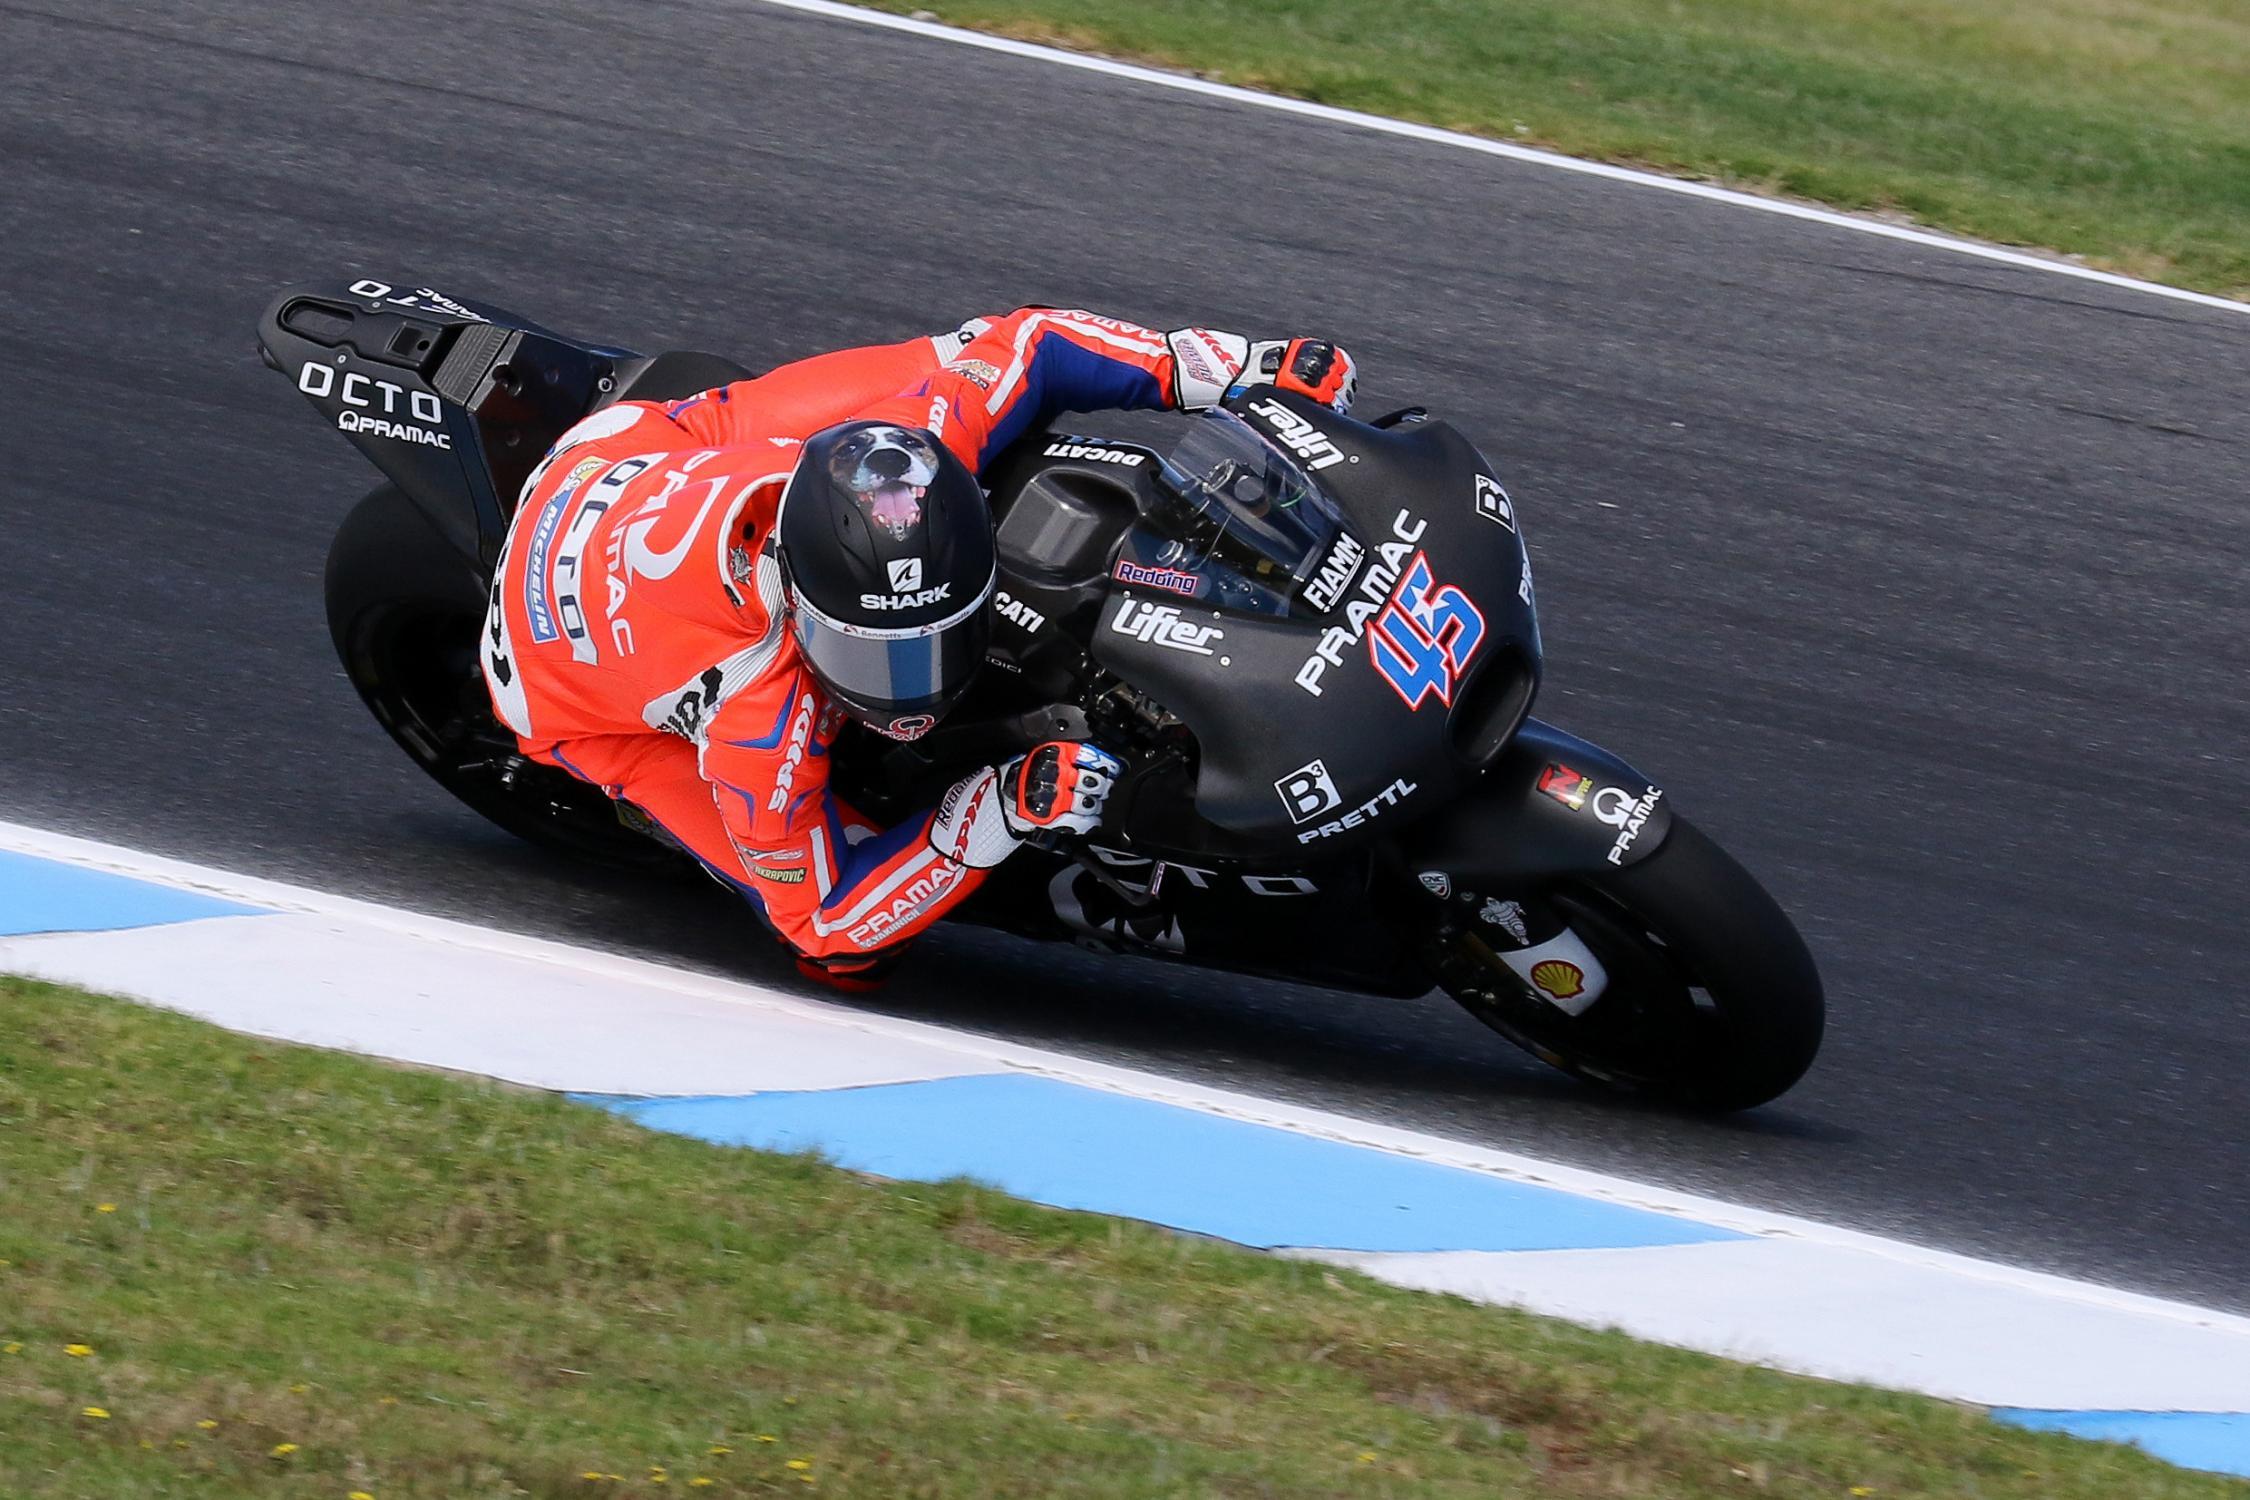 [MotoGP] Test Phillip Island 45-scott-redding-eng1p6a0407.gallery_full_top_fullscreen